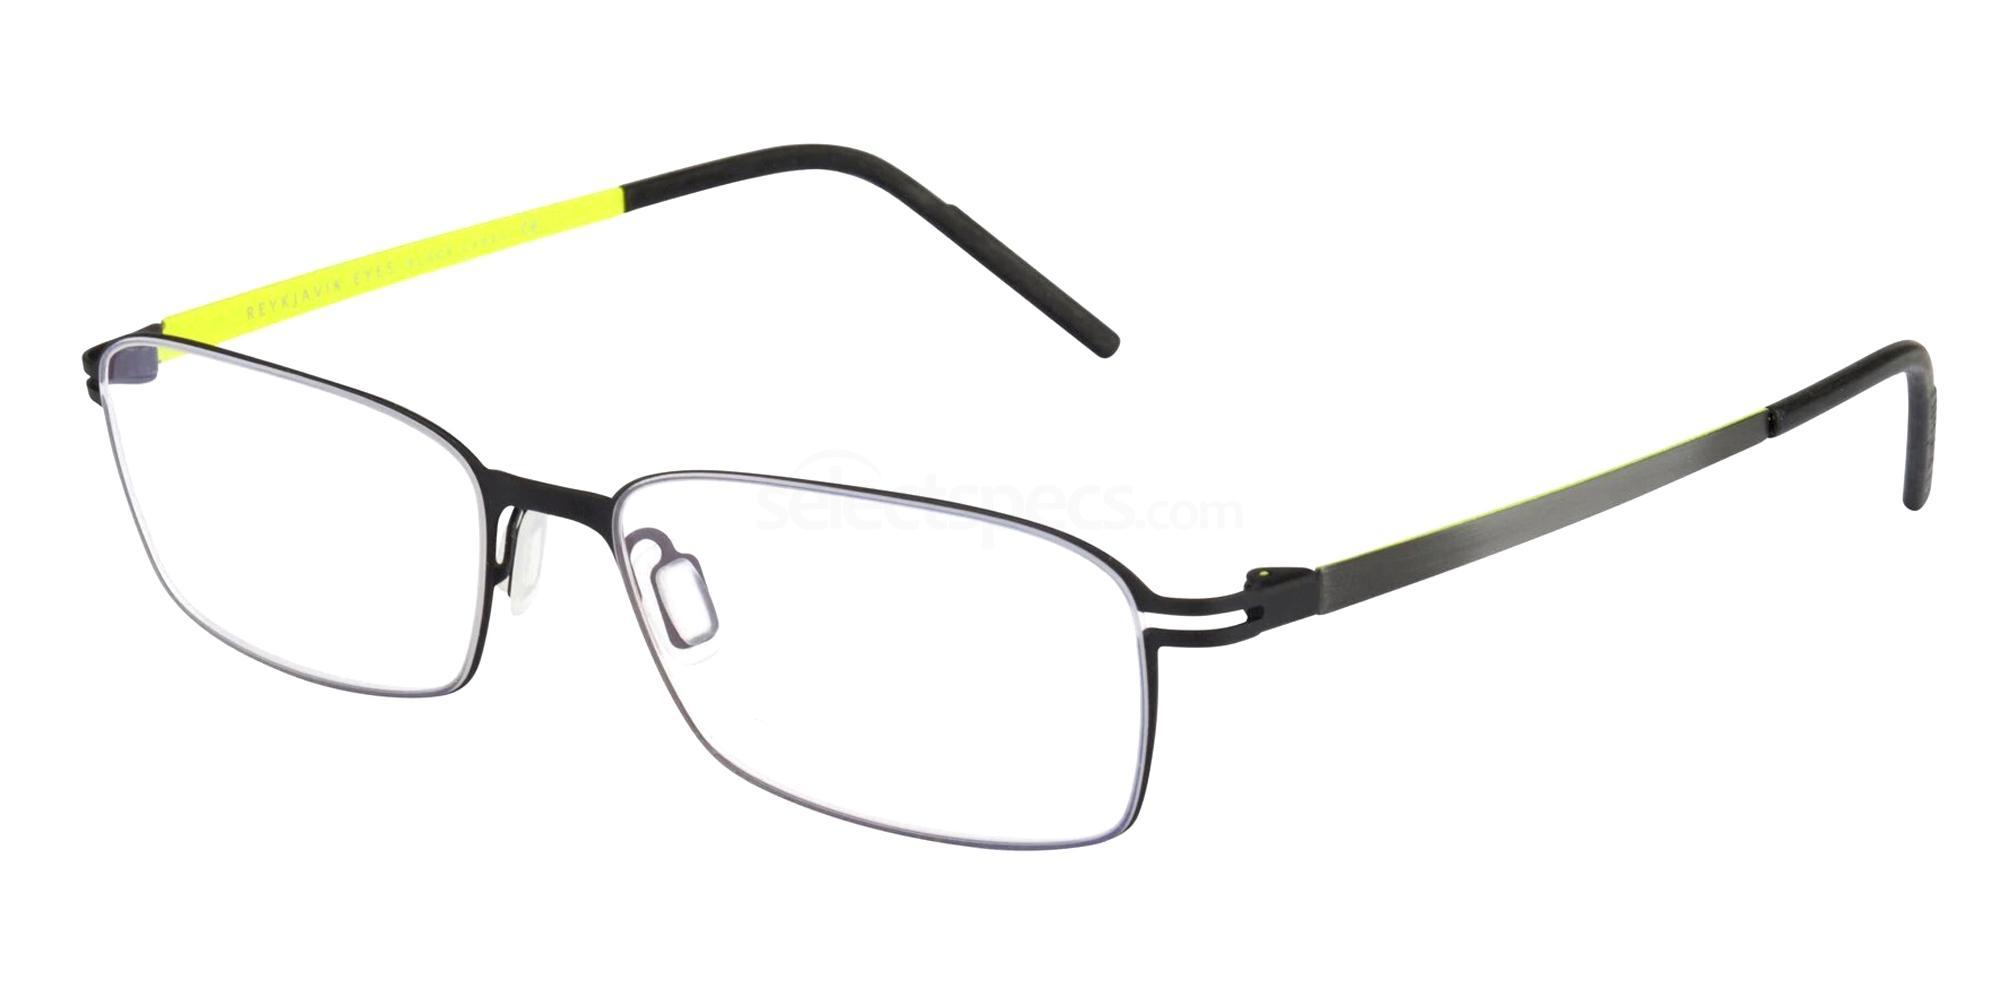 C1 SAGA Glasses, Reykjavik Eyes Black Label